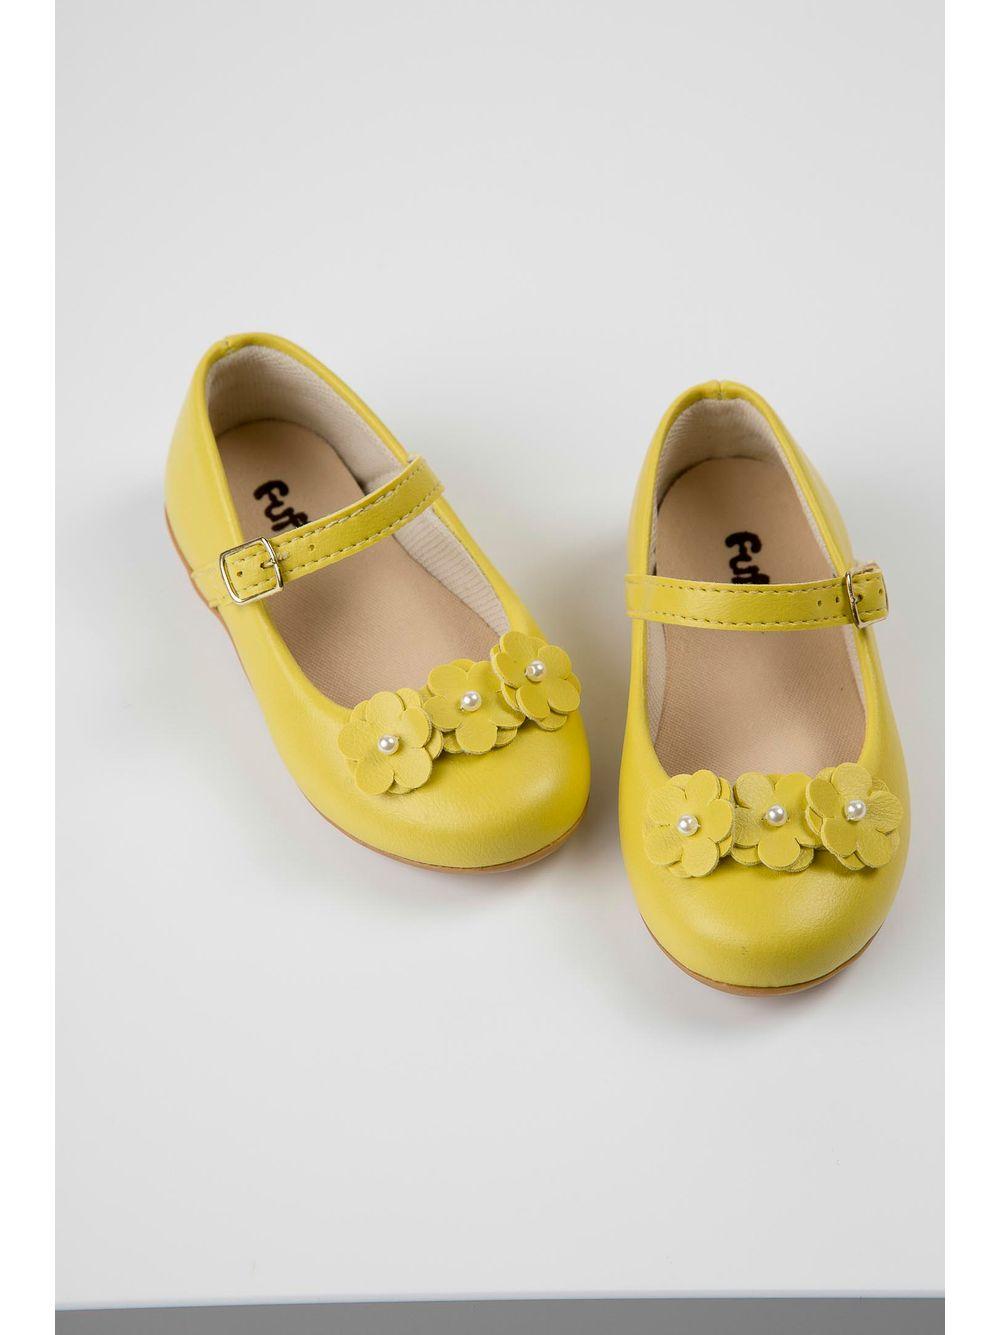 819c472193 Sapatilha Boneca Fuffy Flor Infantil Menina Amarelo - pittol